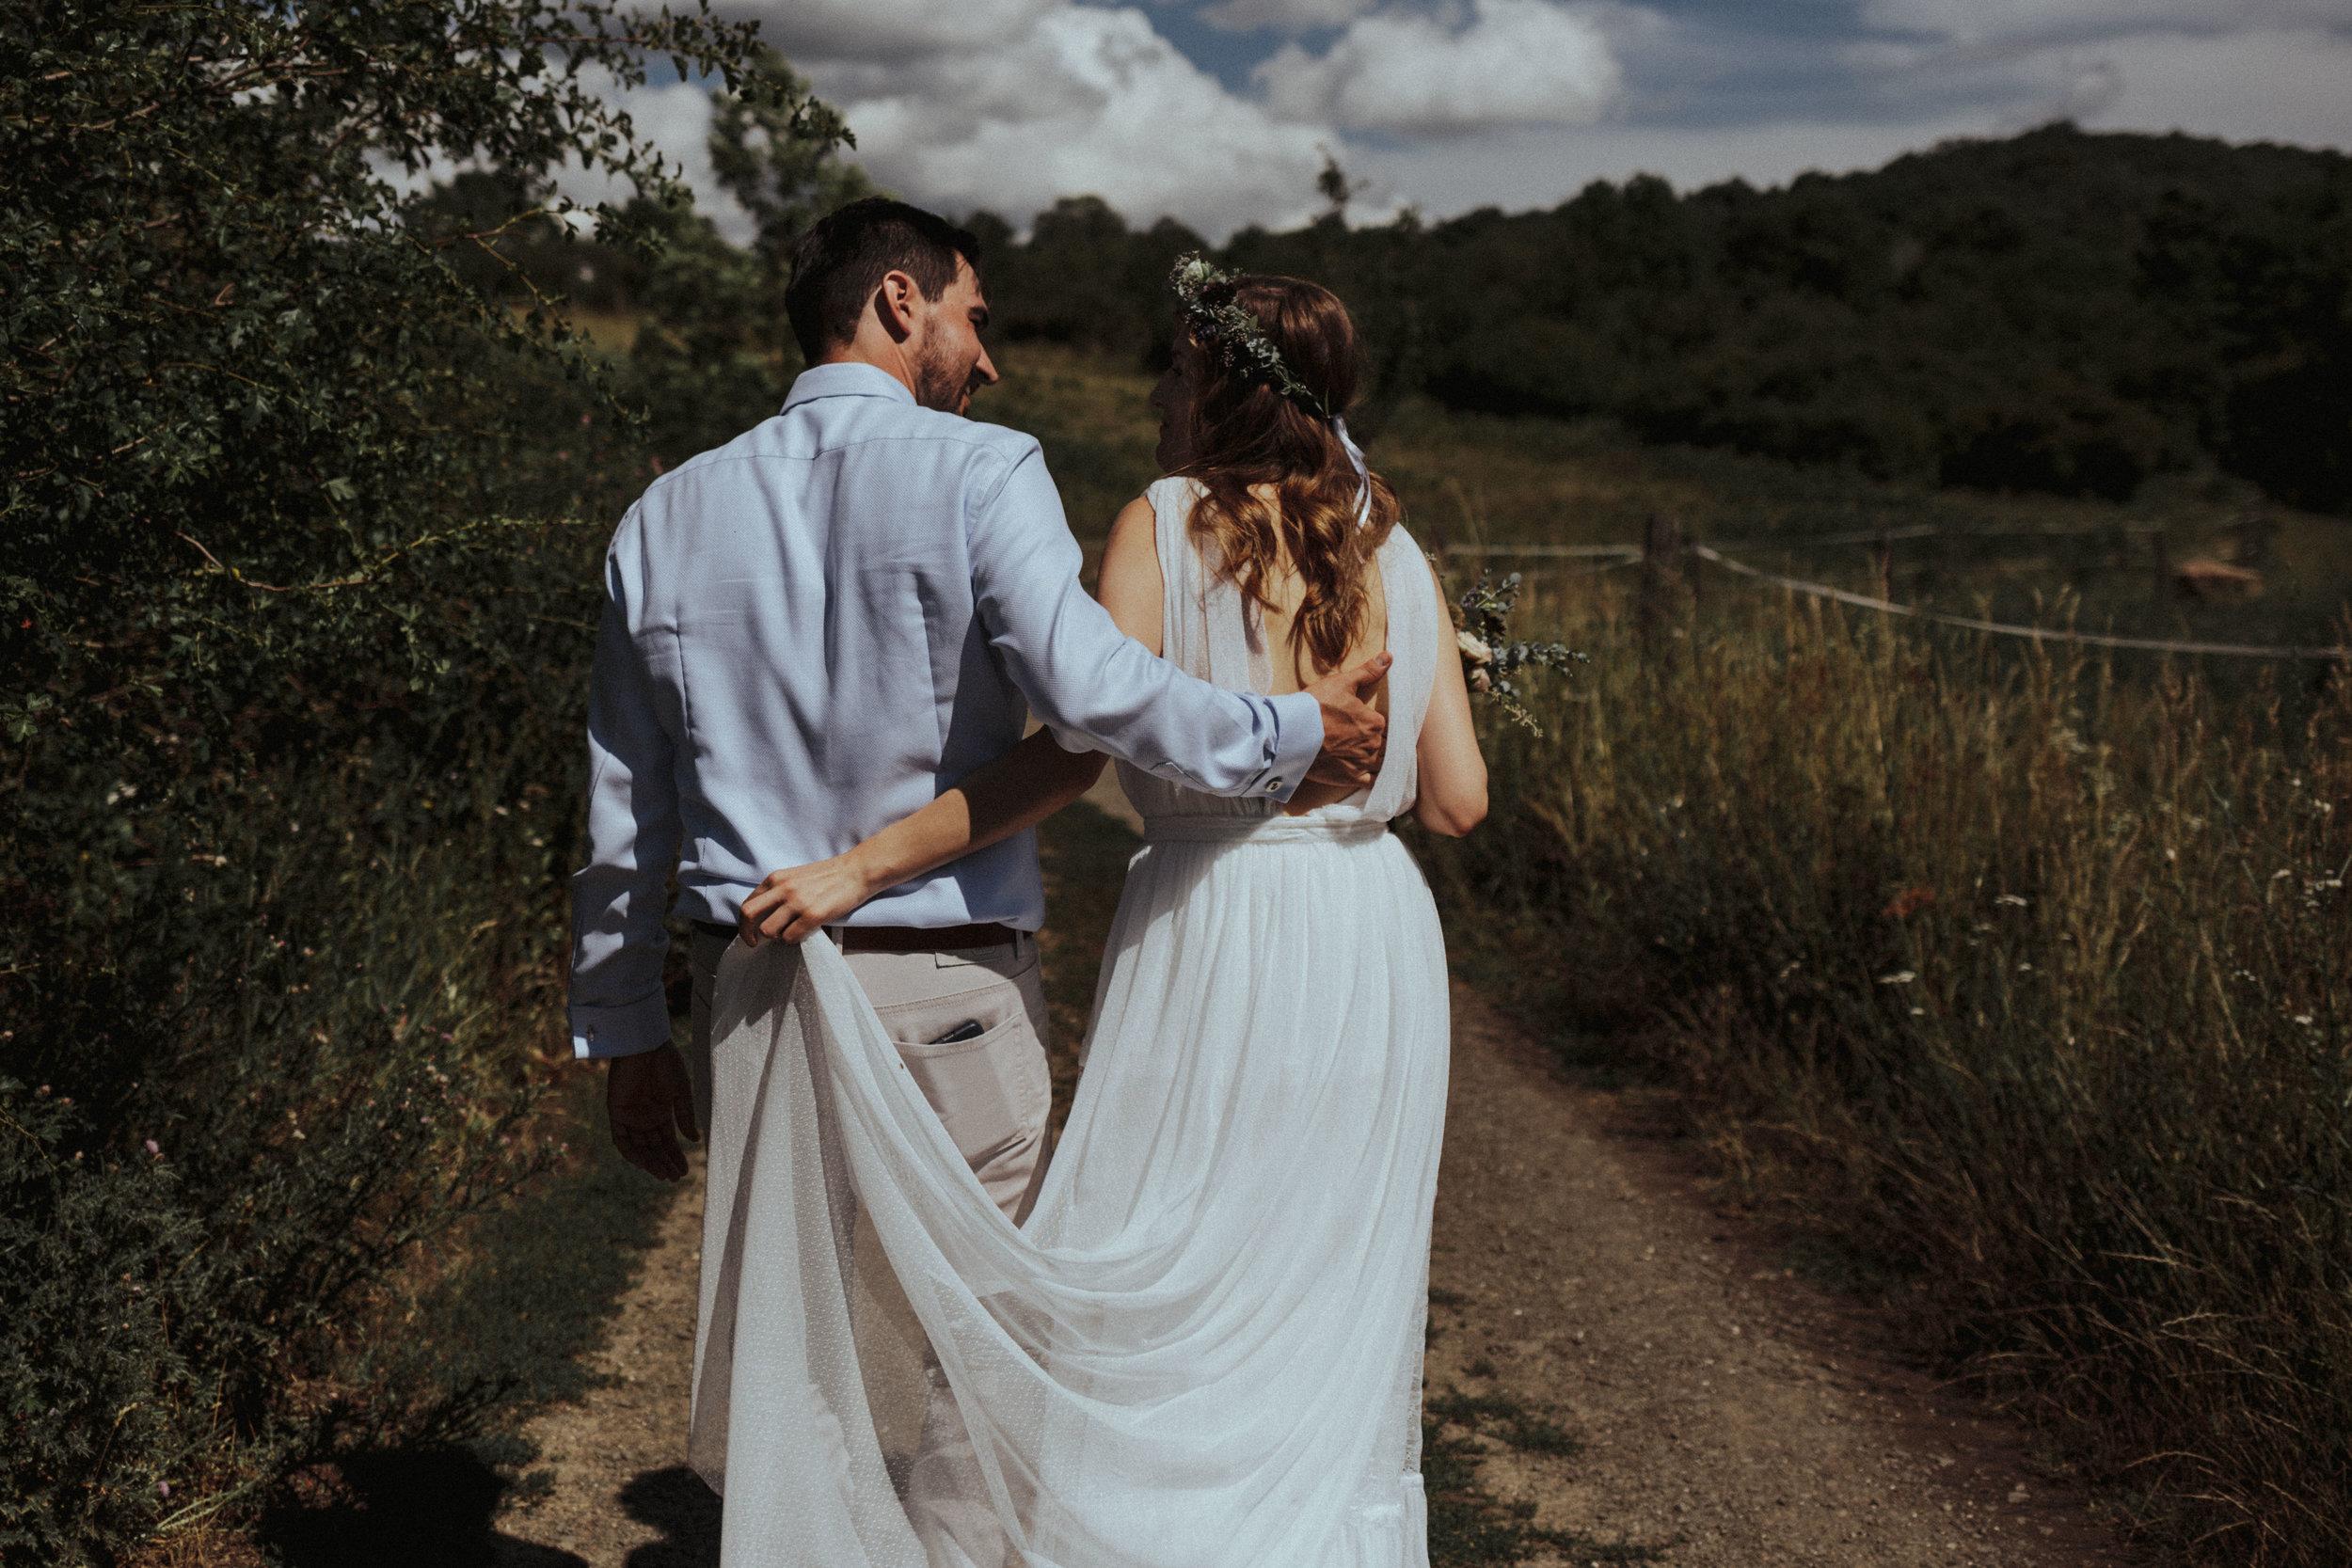 20170701_Lilla+Tomi_wedding_w_204__MG_2526.jpg